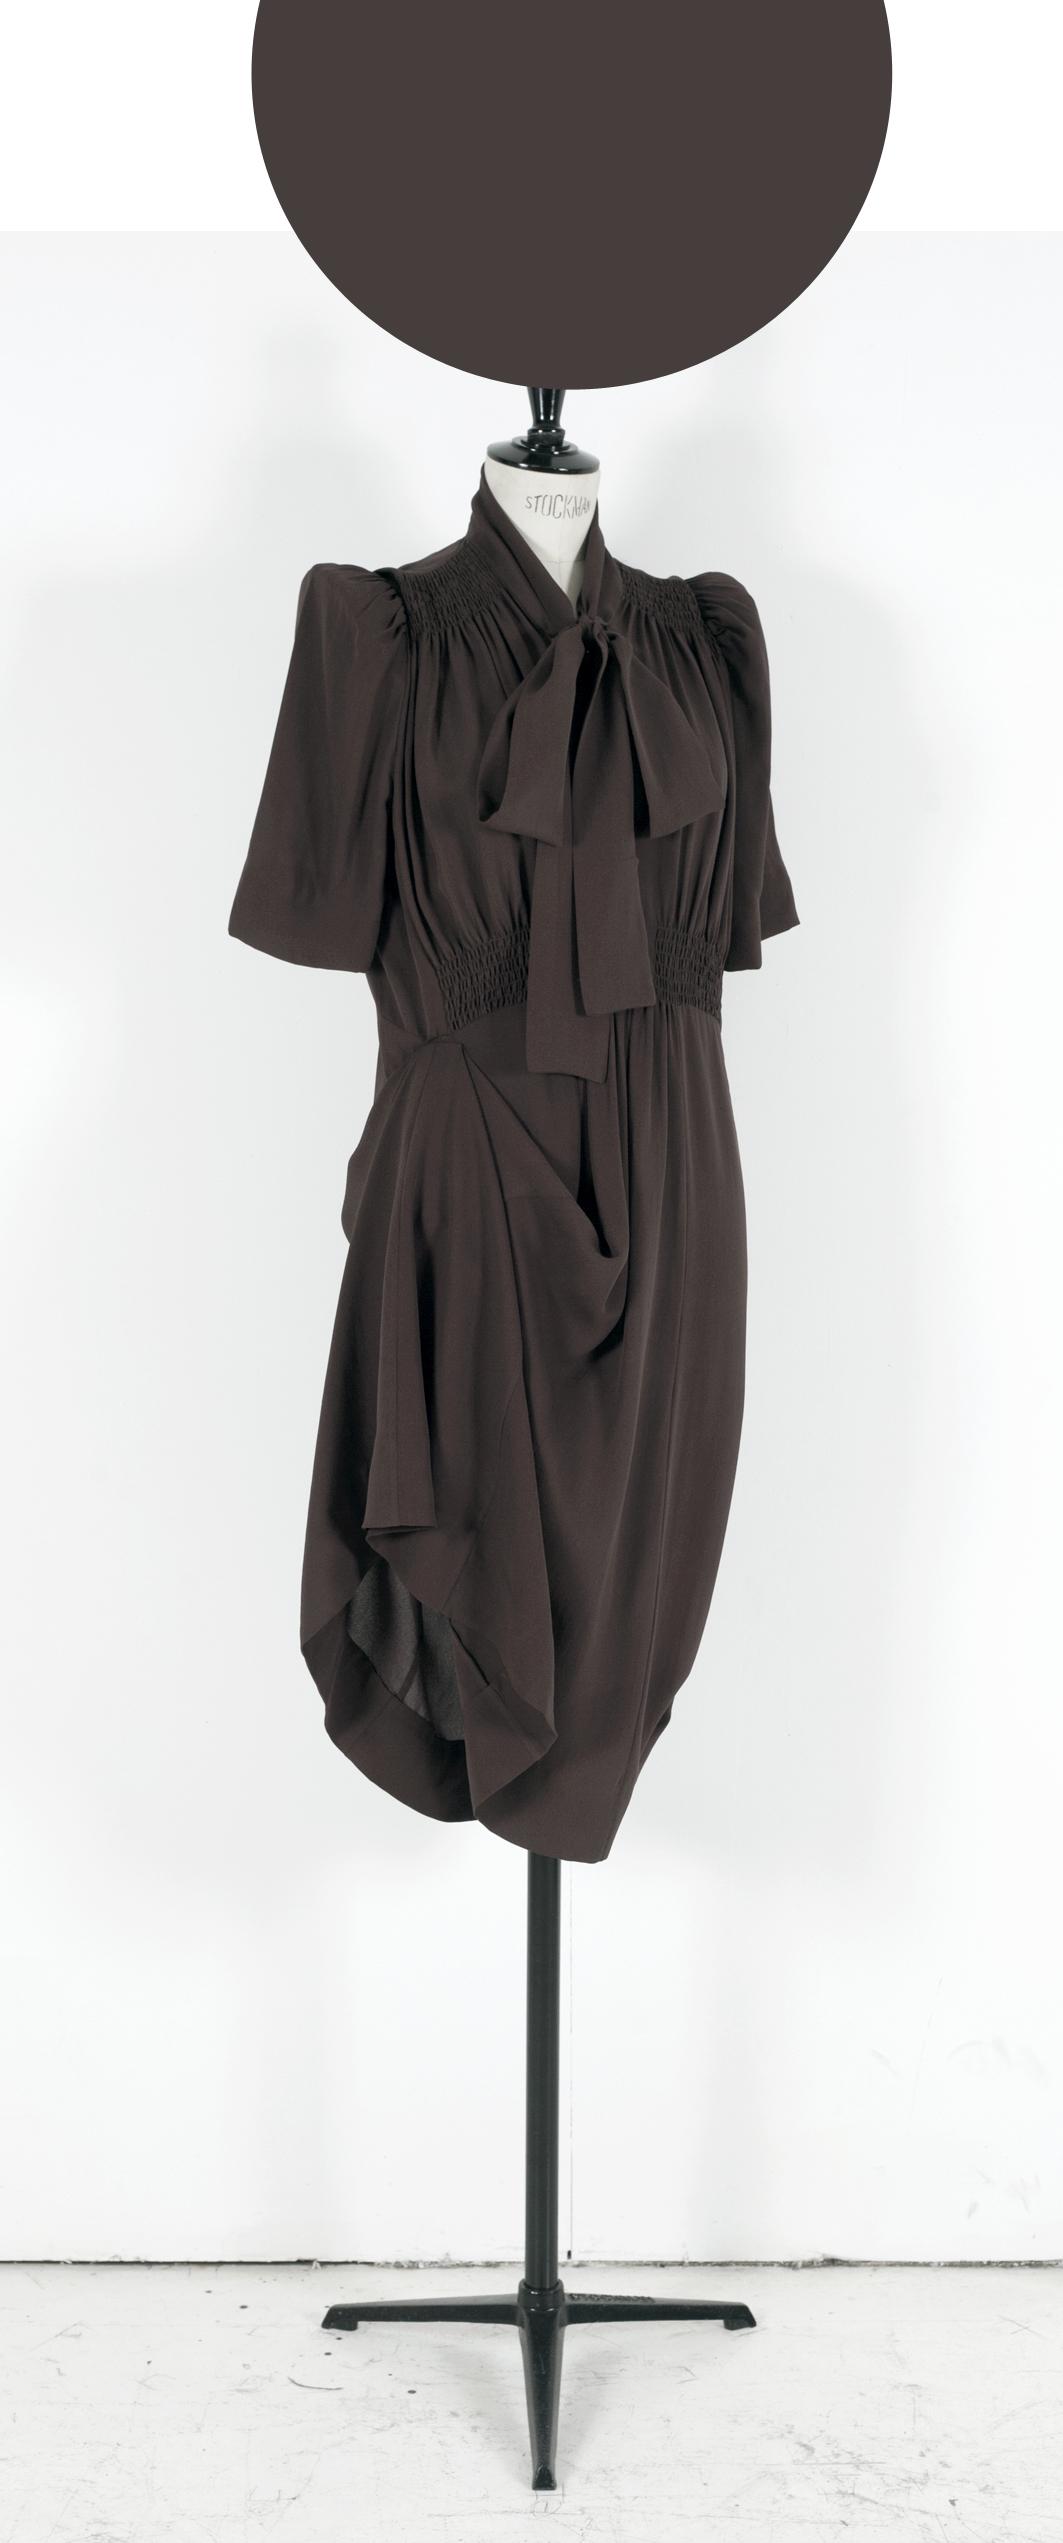 01 WINE BROWN/ Short Sleeve Knee length Part Adjustor Dress